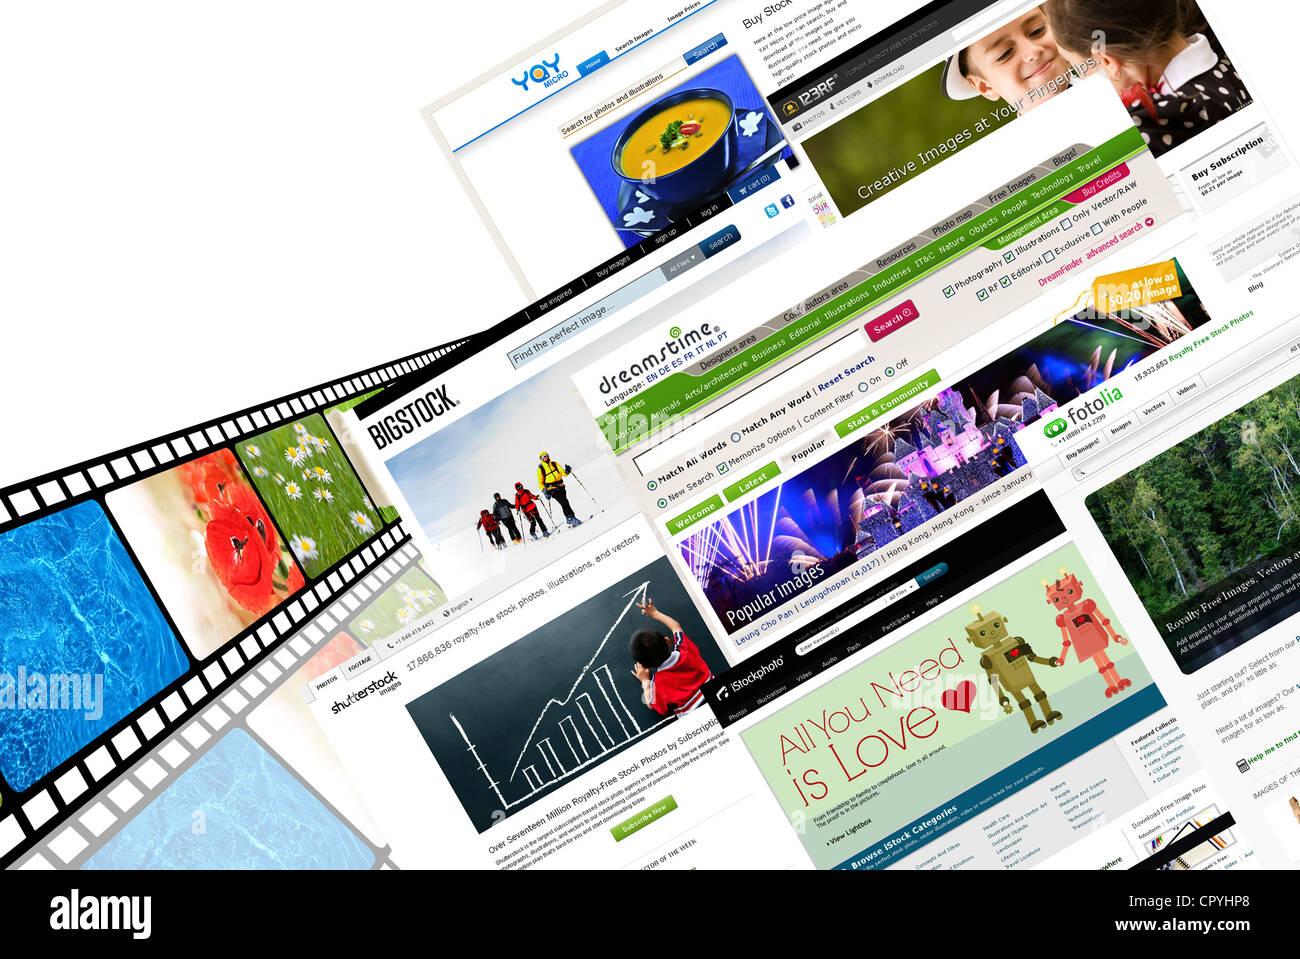 stock photography websites - Stock Image